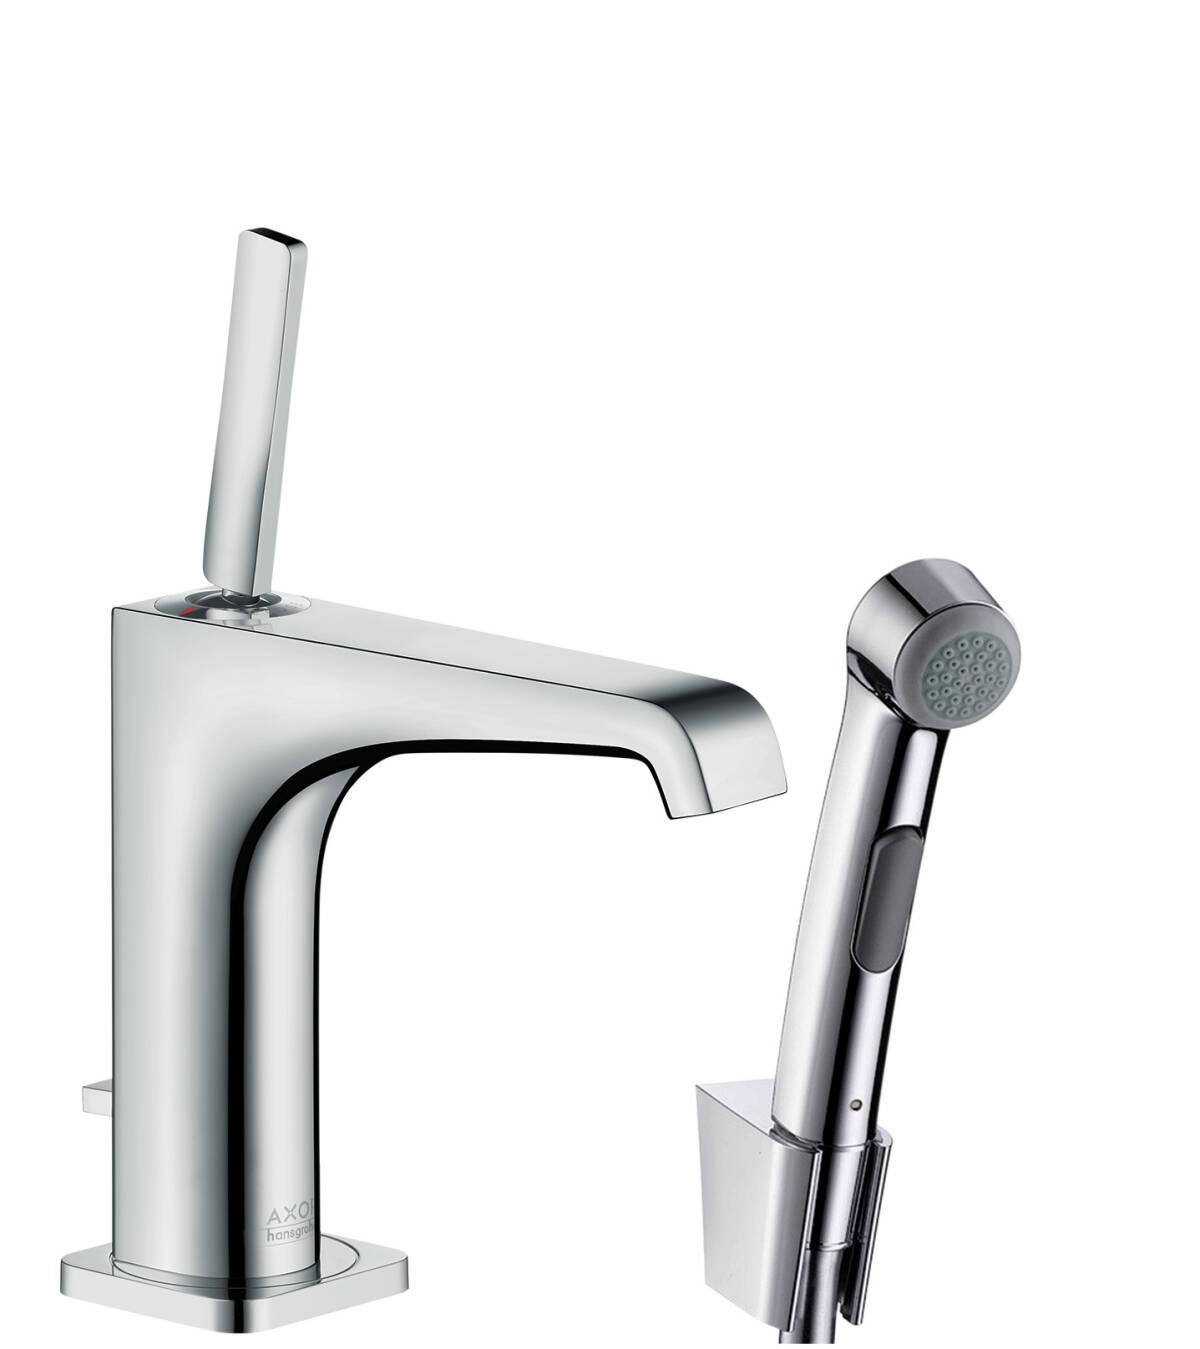 Bidette Set 1jet hand shower/ Axor Citterio E single lever basin mixer, Polished Black Chrome, 36130330